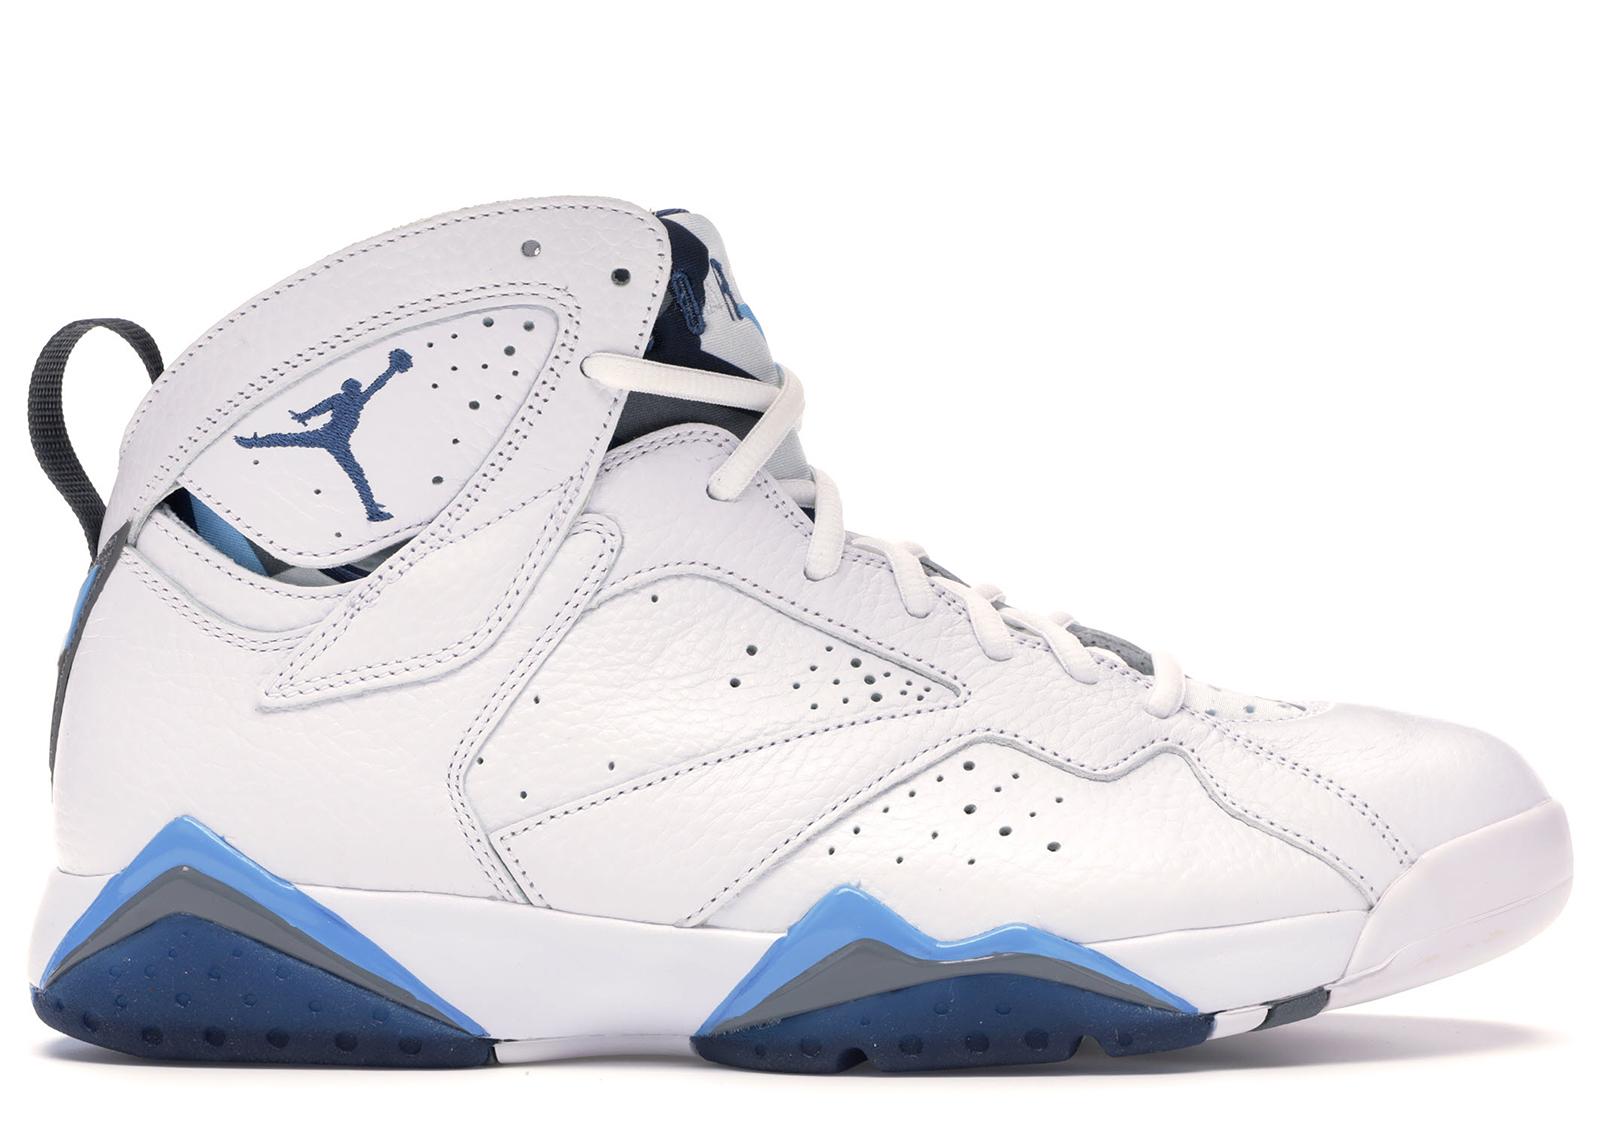 Jordan 7 Retro French Blue (2015